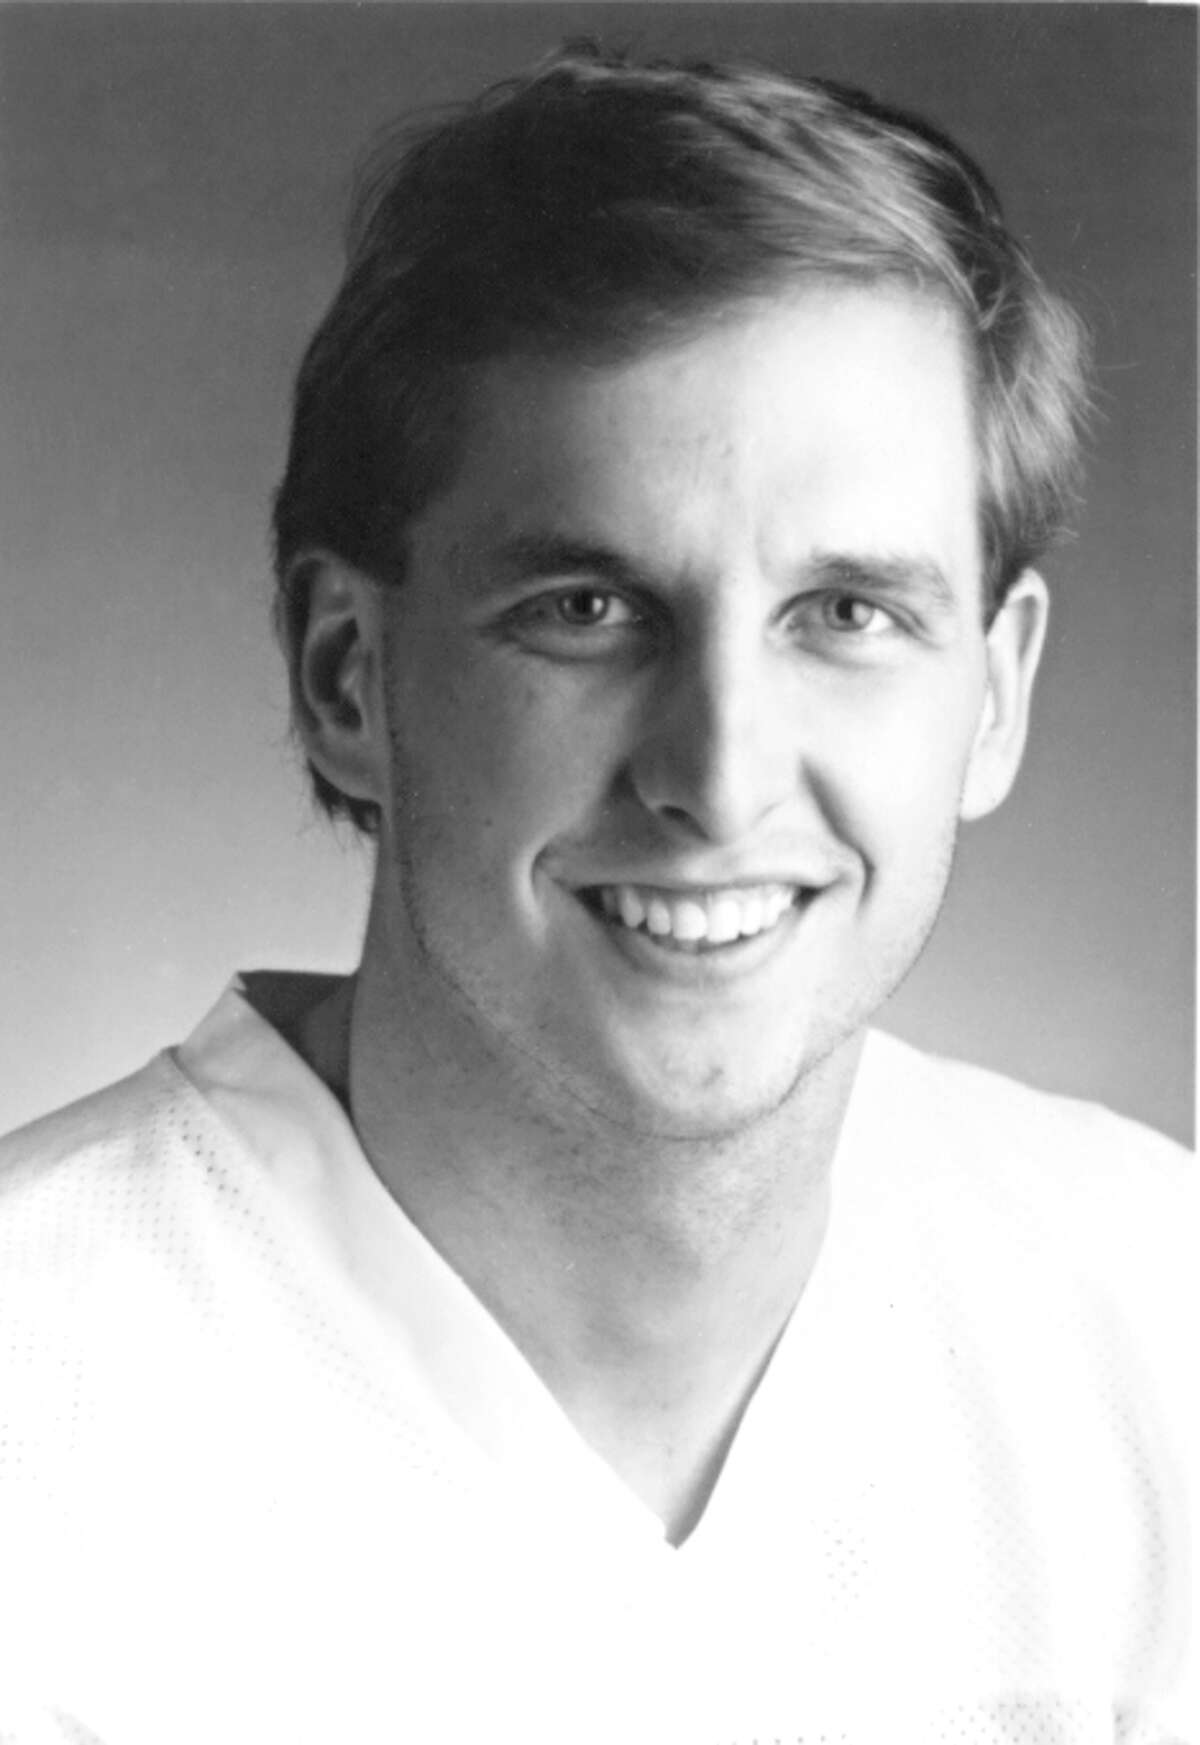 BYU quarterback Ty Detmer